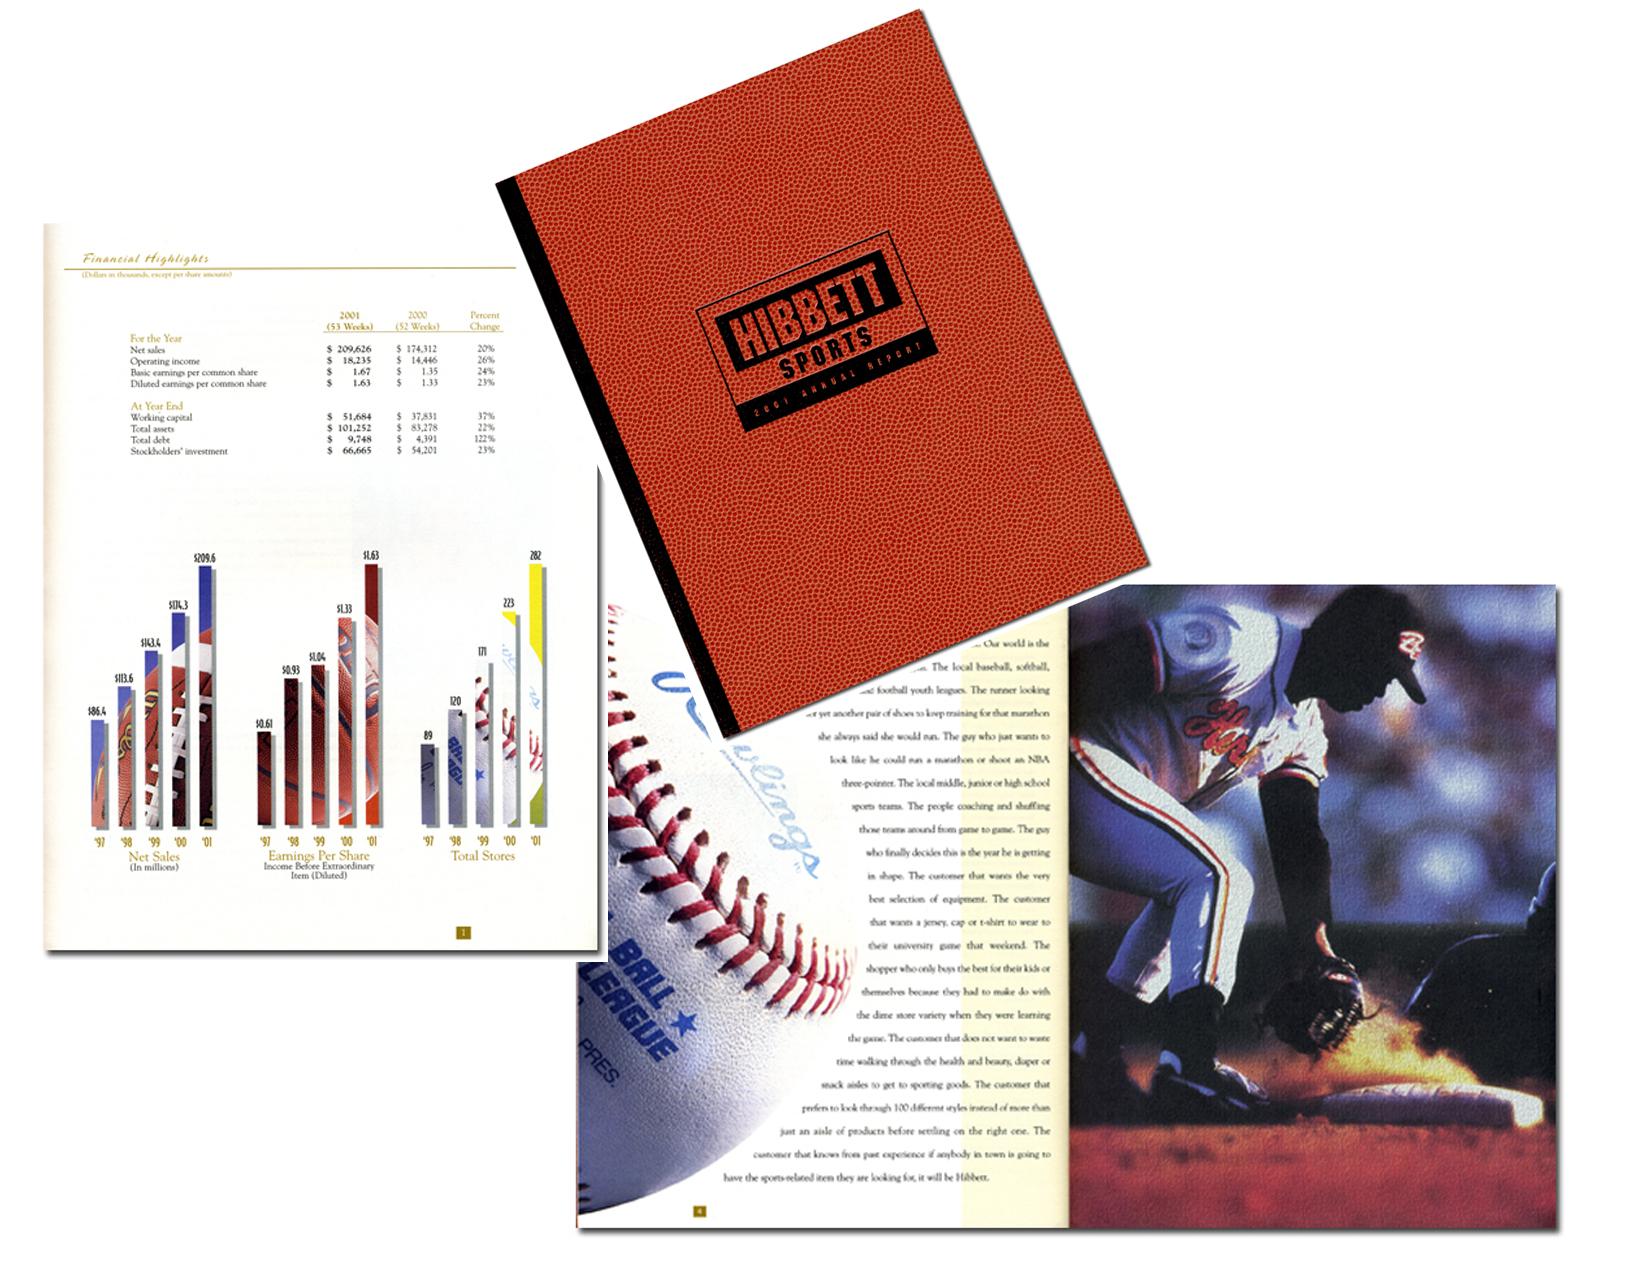 hibbett sporting goods annual report